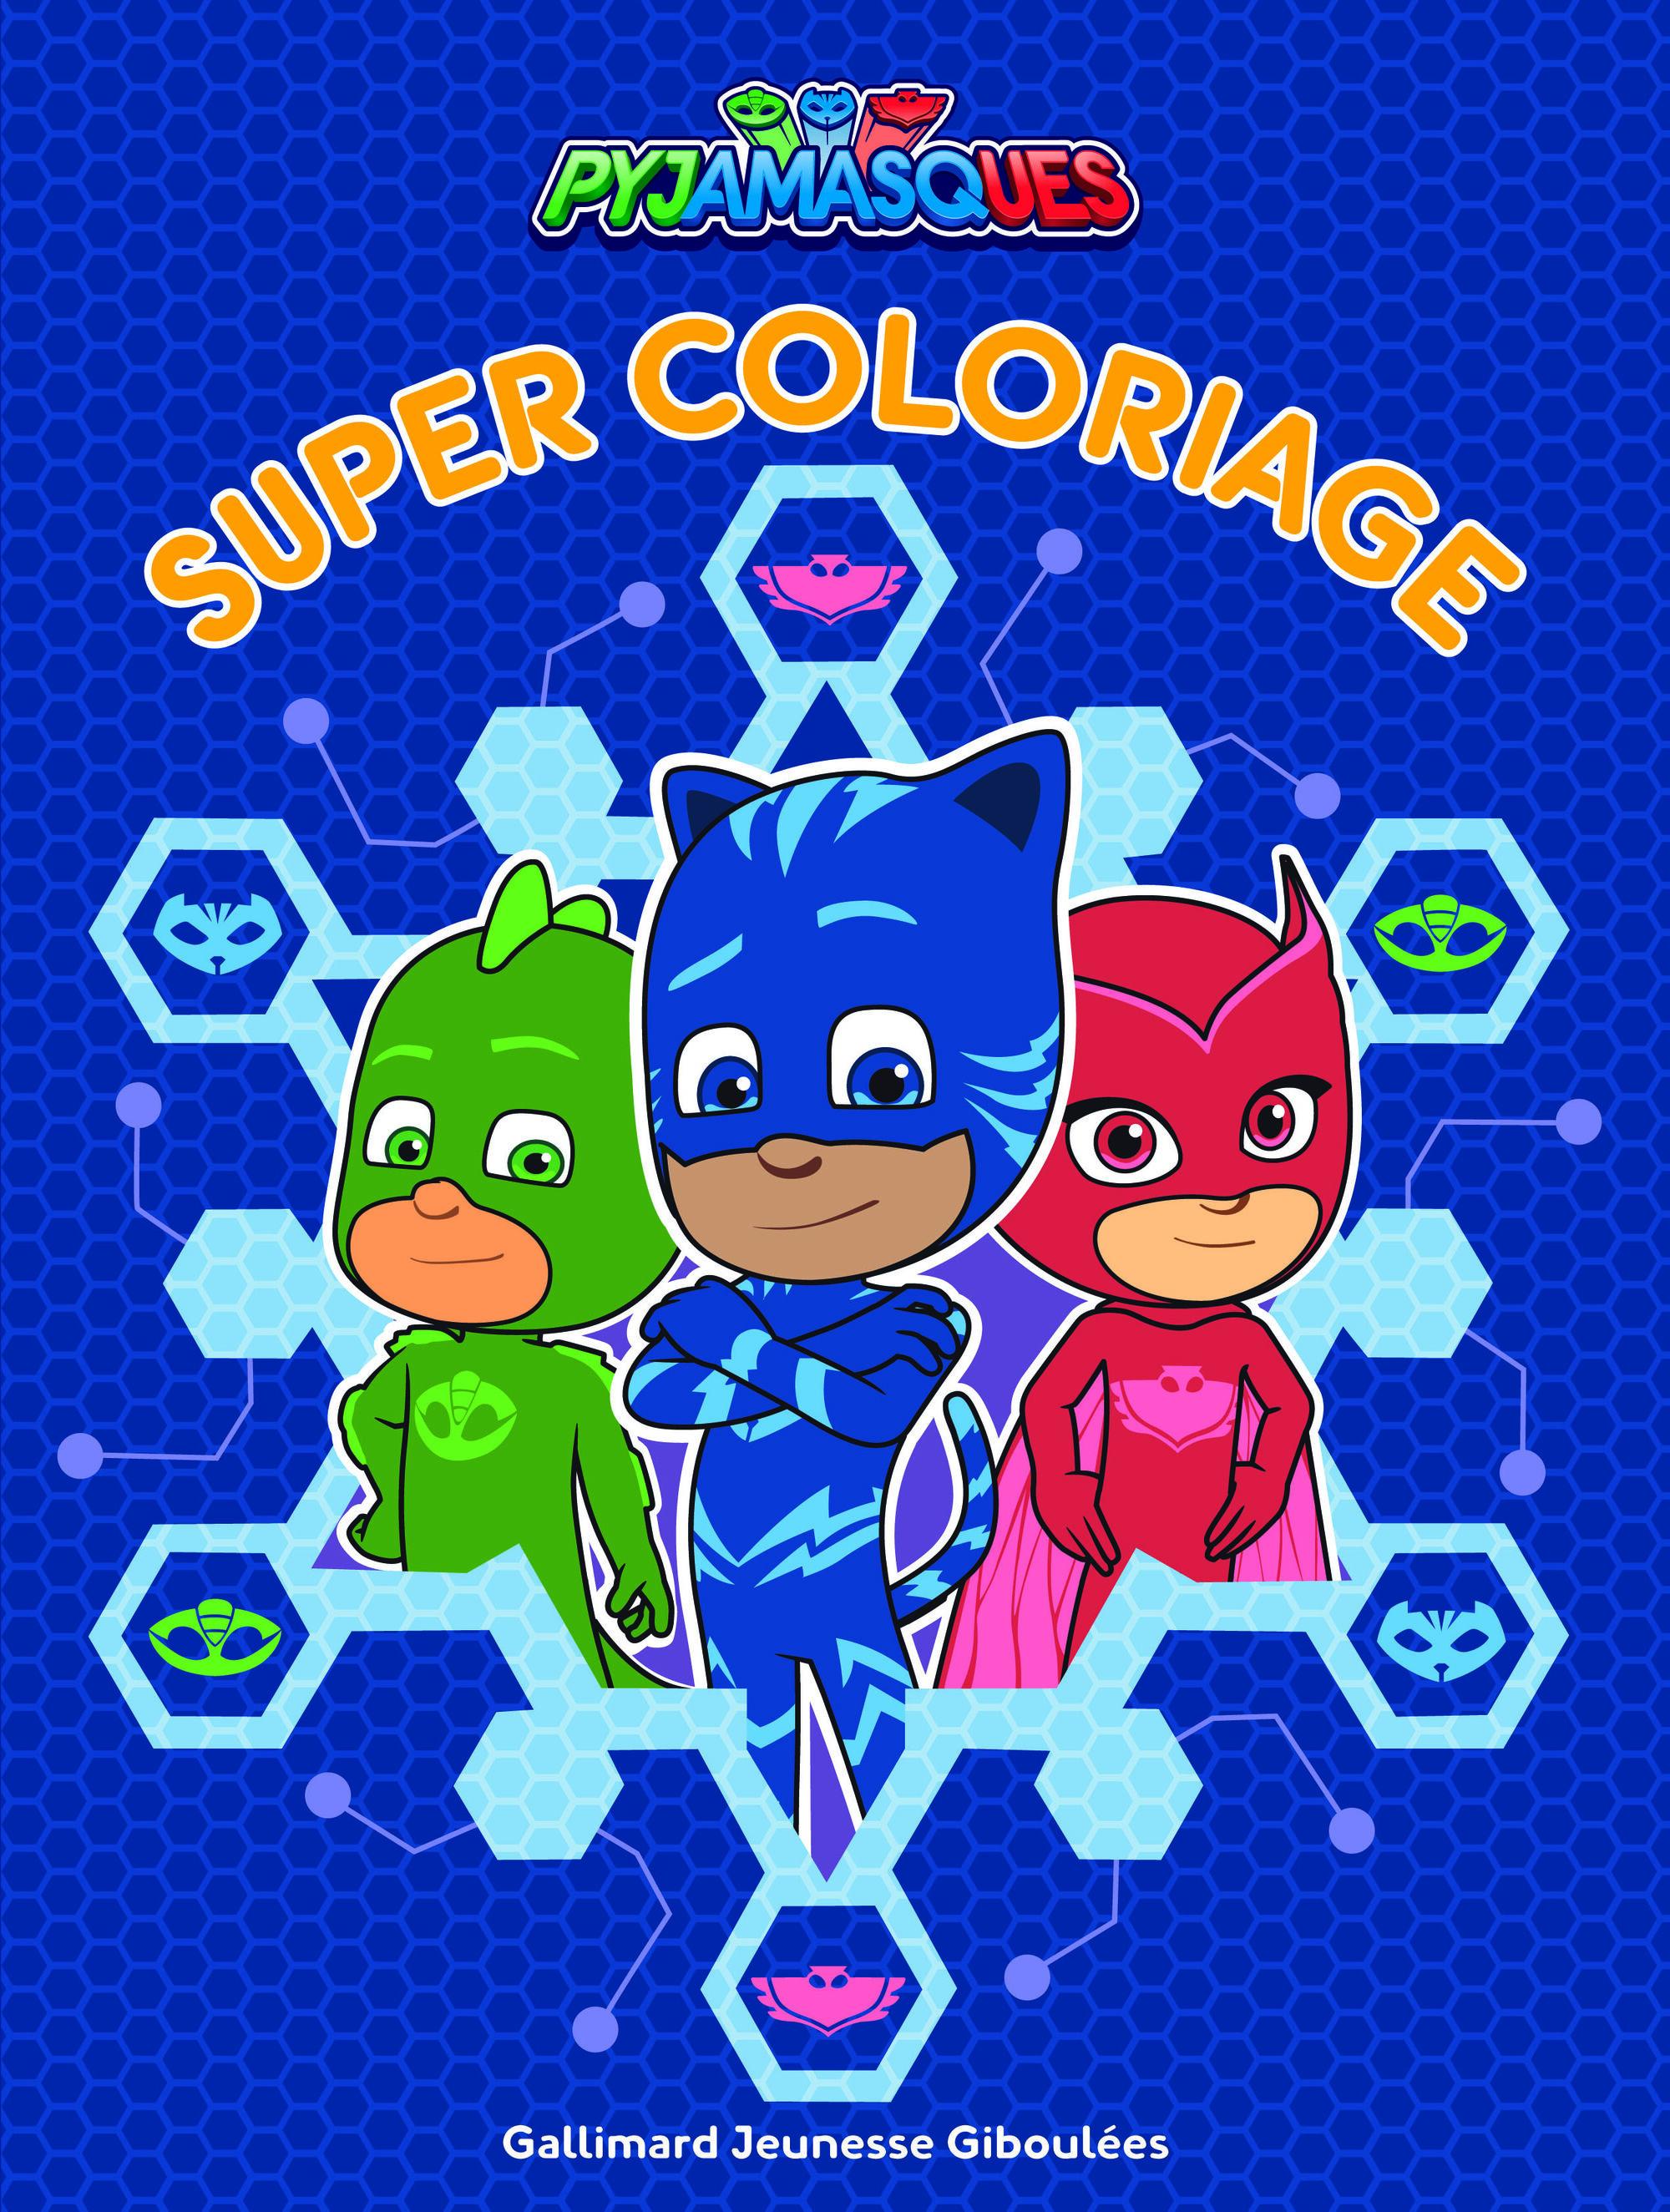 Super coloriage Pyjamasques  PJ Masks Wiki  Fandom